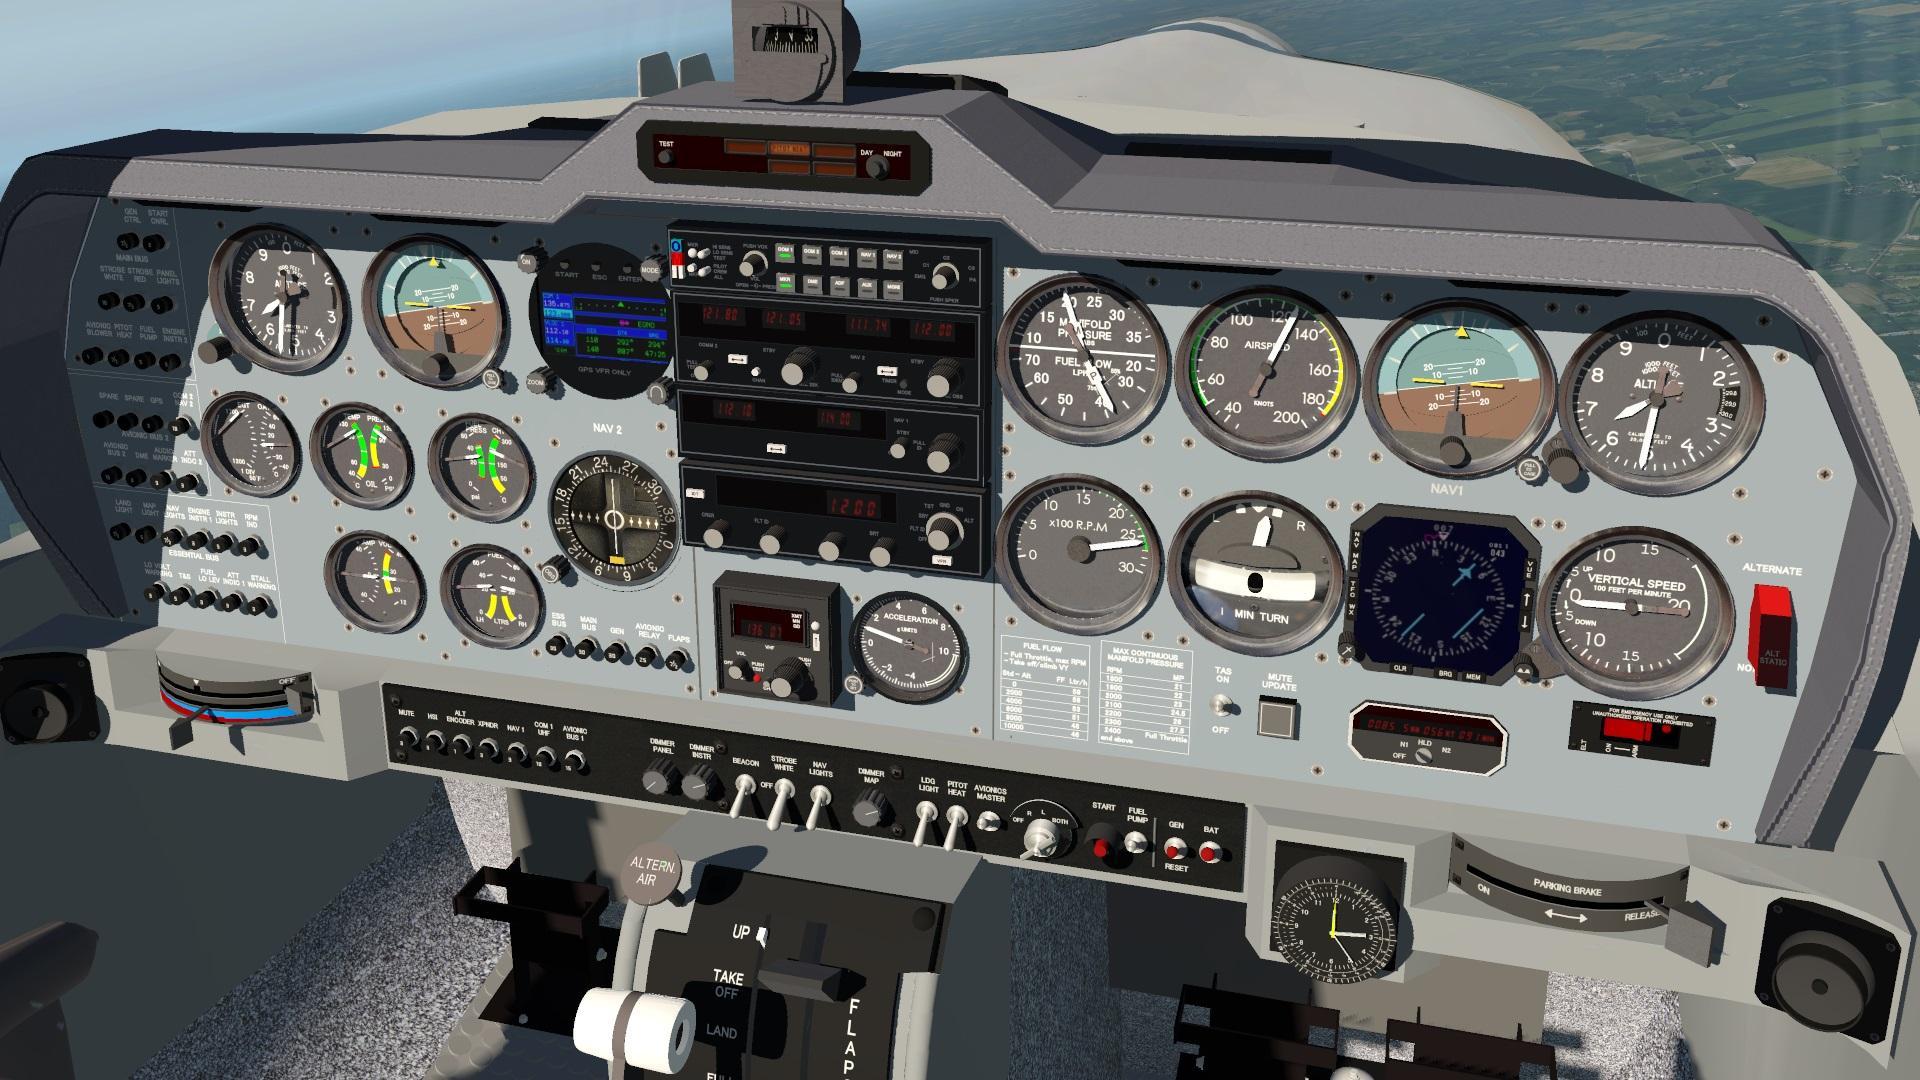 Tutor 115E Community Edition - Military Aircraft - X-Plane